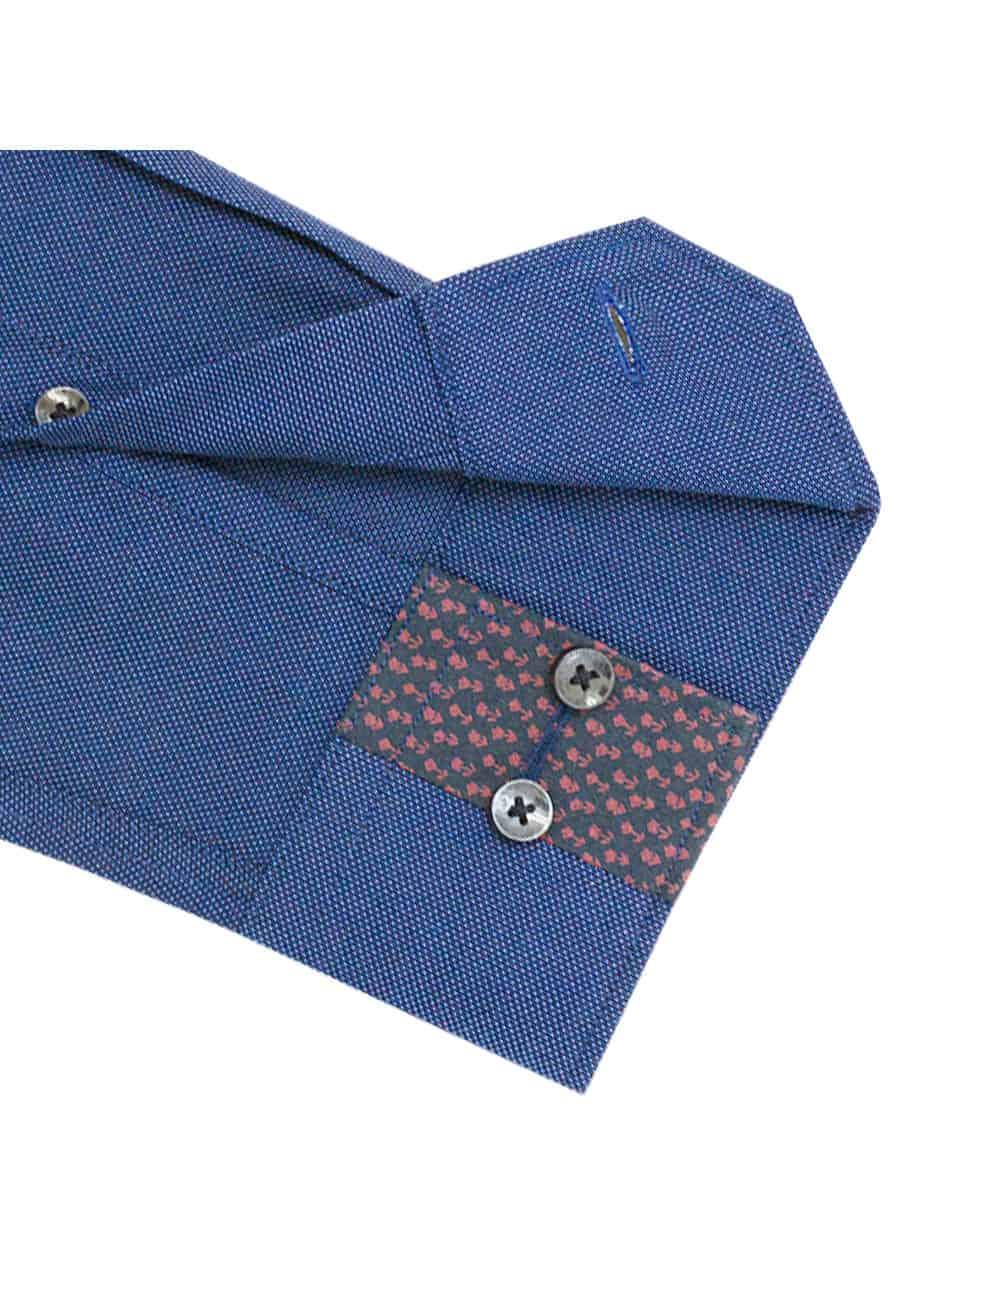 TF Blue Pattern Easy Iron 100% Premium Cotton Long Sleeve Single Cuff Shirt TF2F4.15